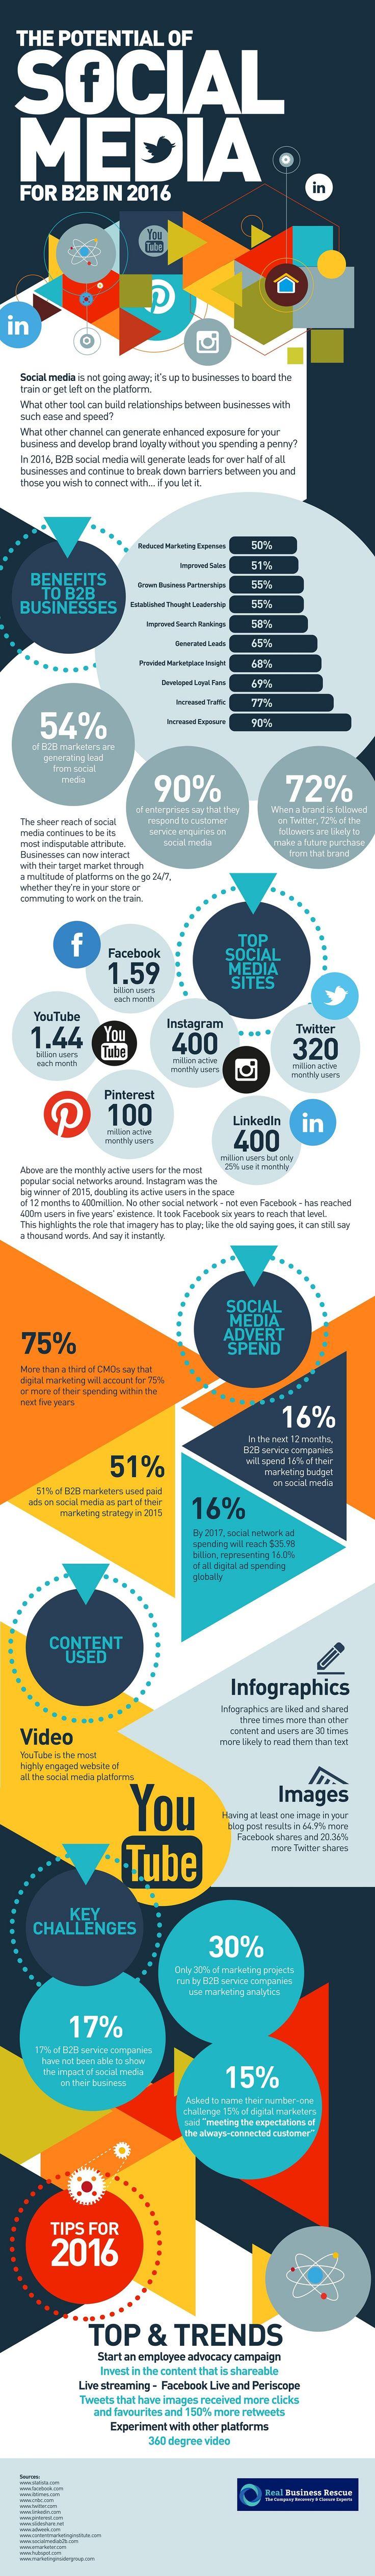 Das Potenzial von Social Media im B2B-Umfeld im Jahr 2016 | Kroker's Look @ IT